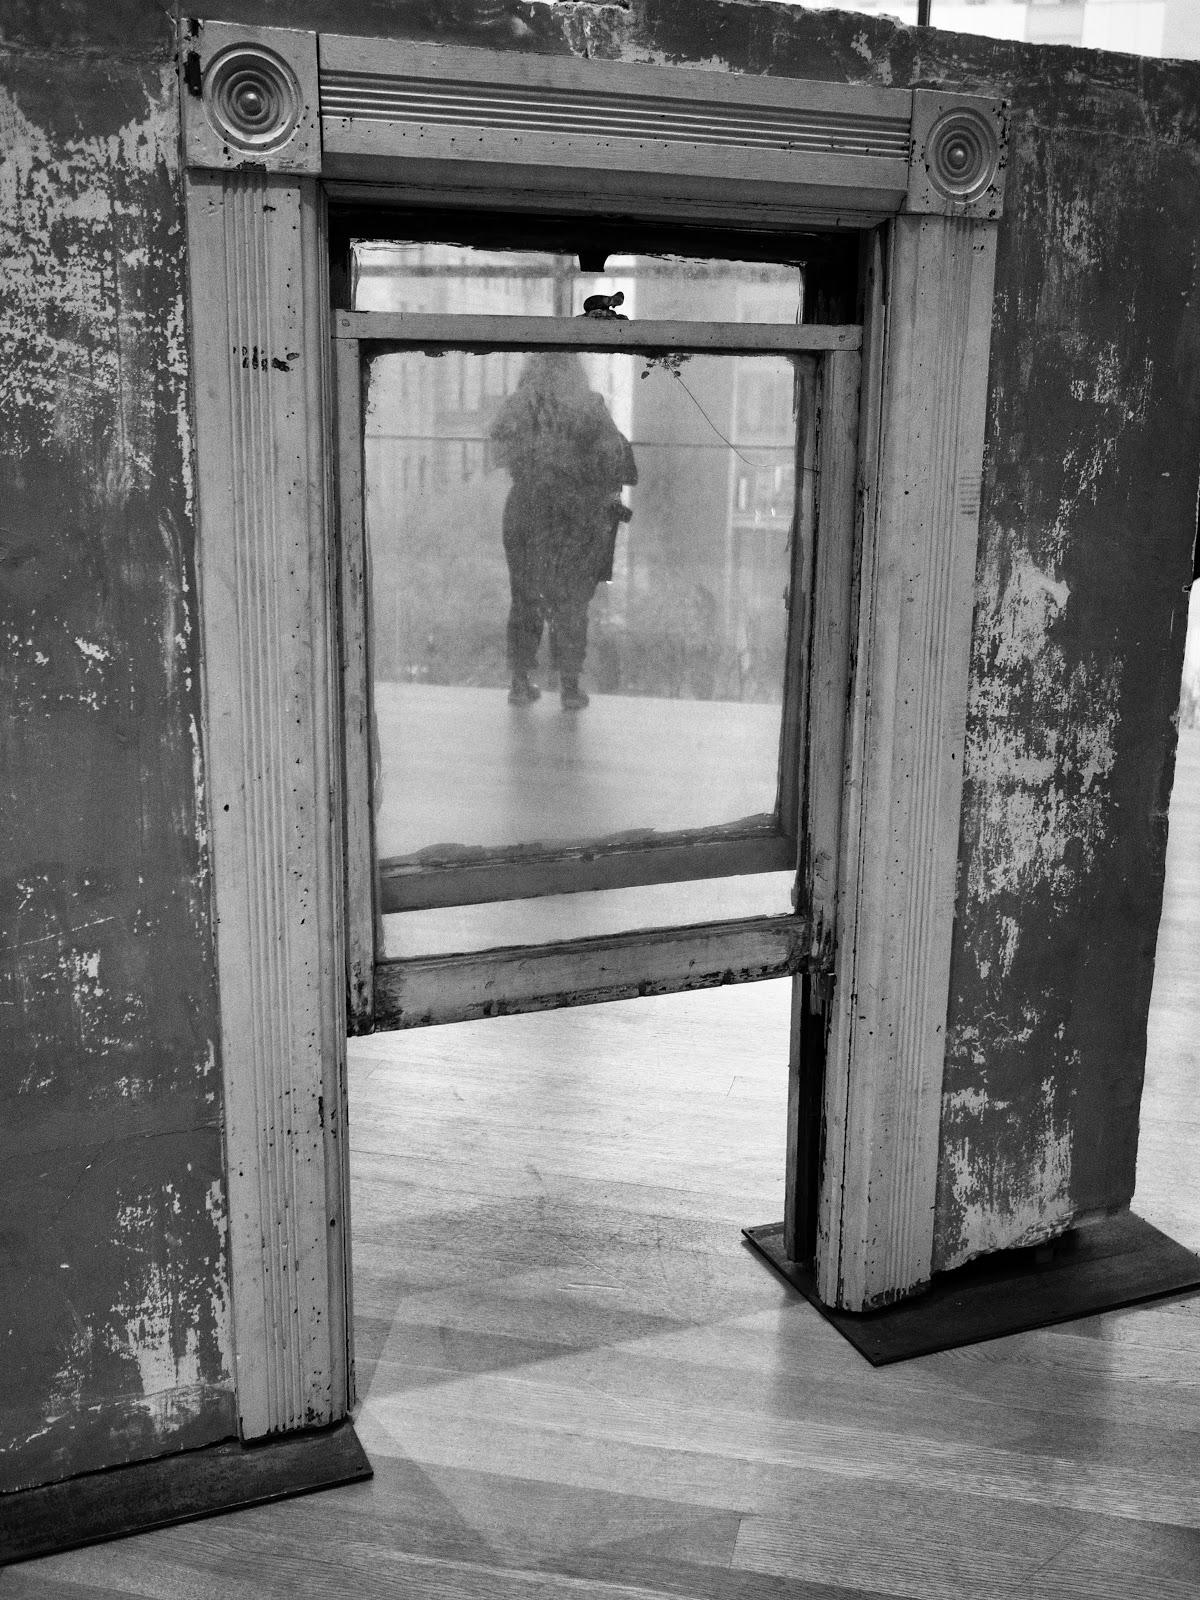 Kelsey Still #KelseyStill #makeportraits #MoMA #MuseumofModernArt   #NYC ©2015 Nancy Lundebjerg